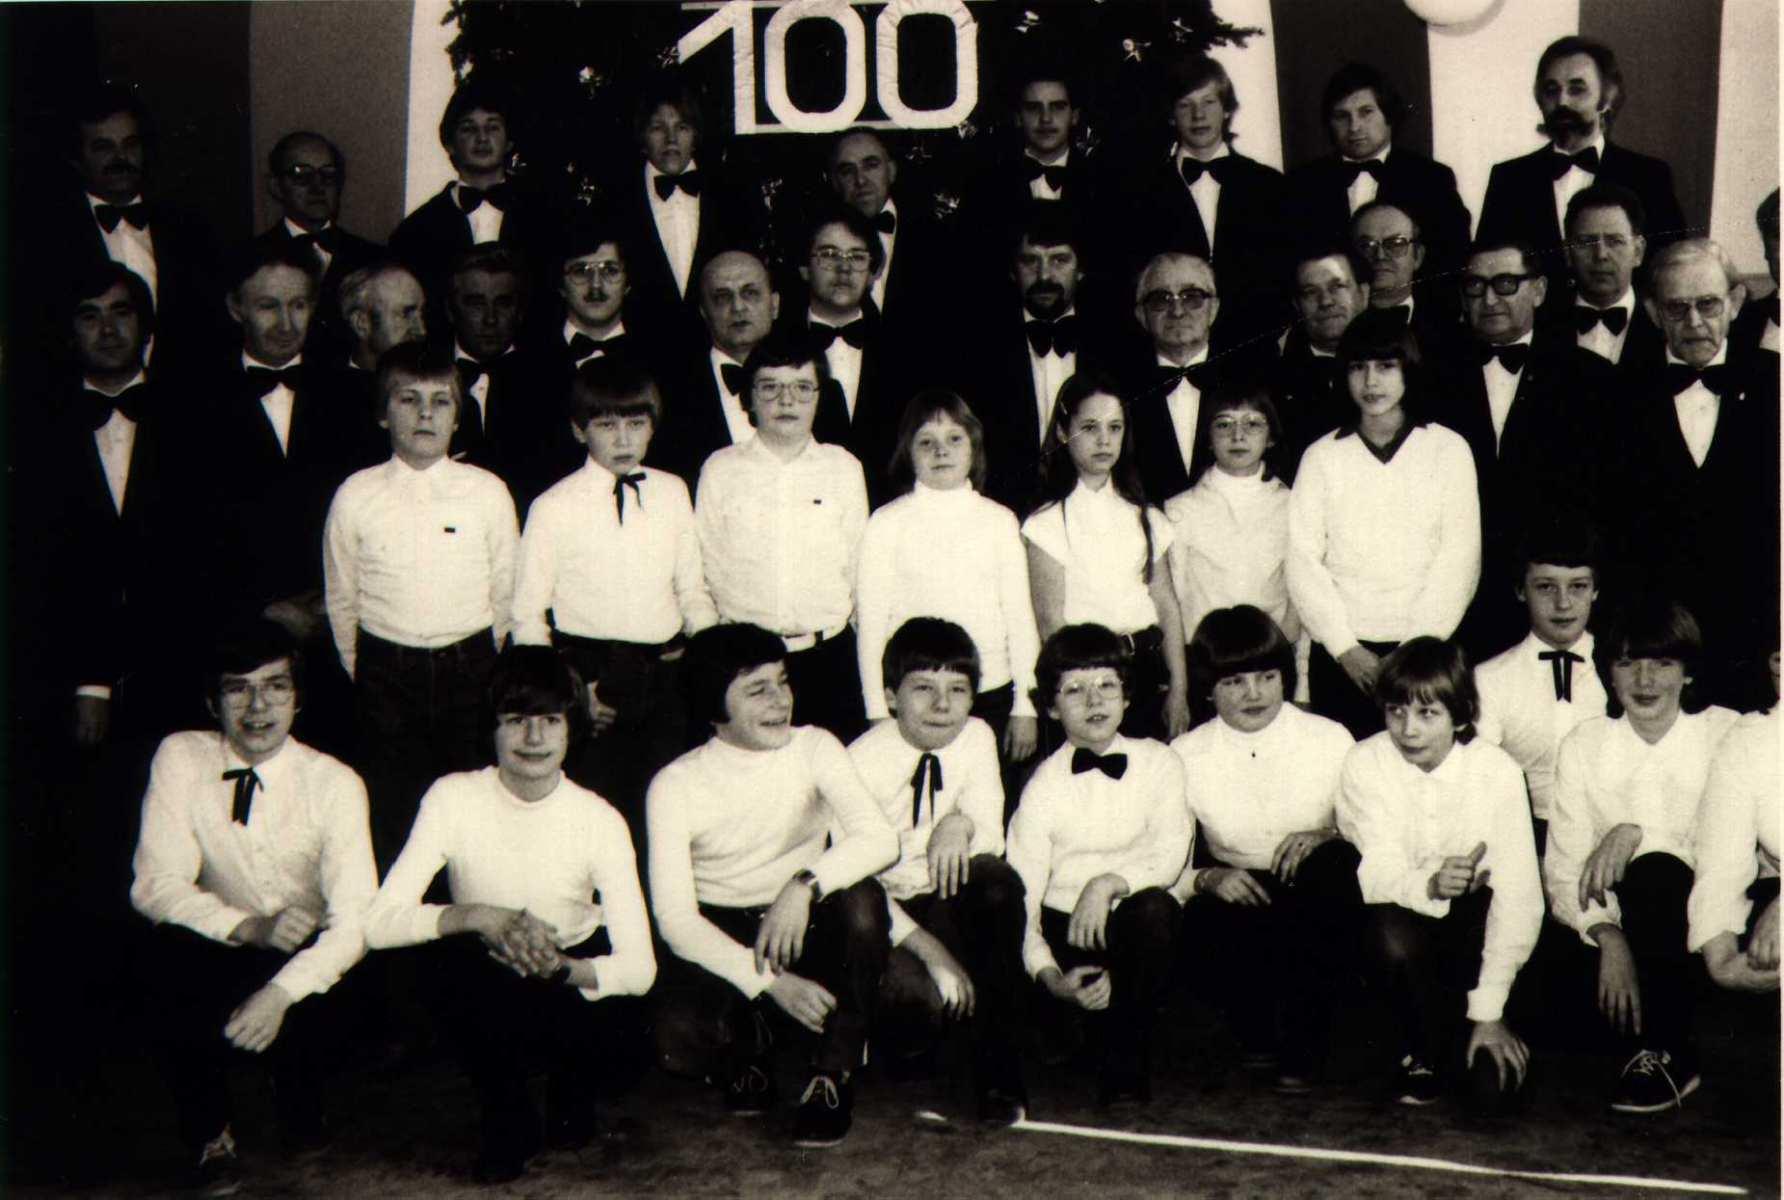 1981-Hw96-003